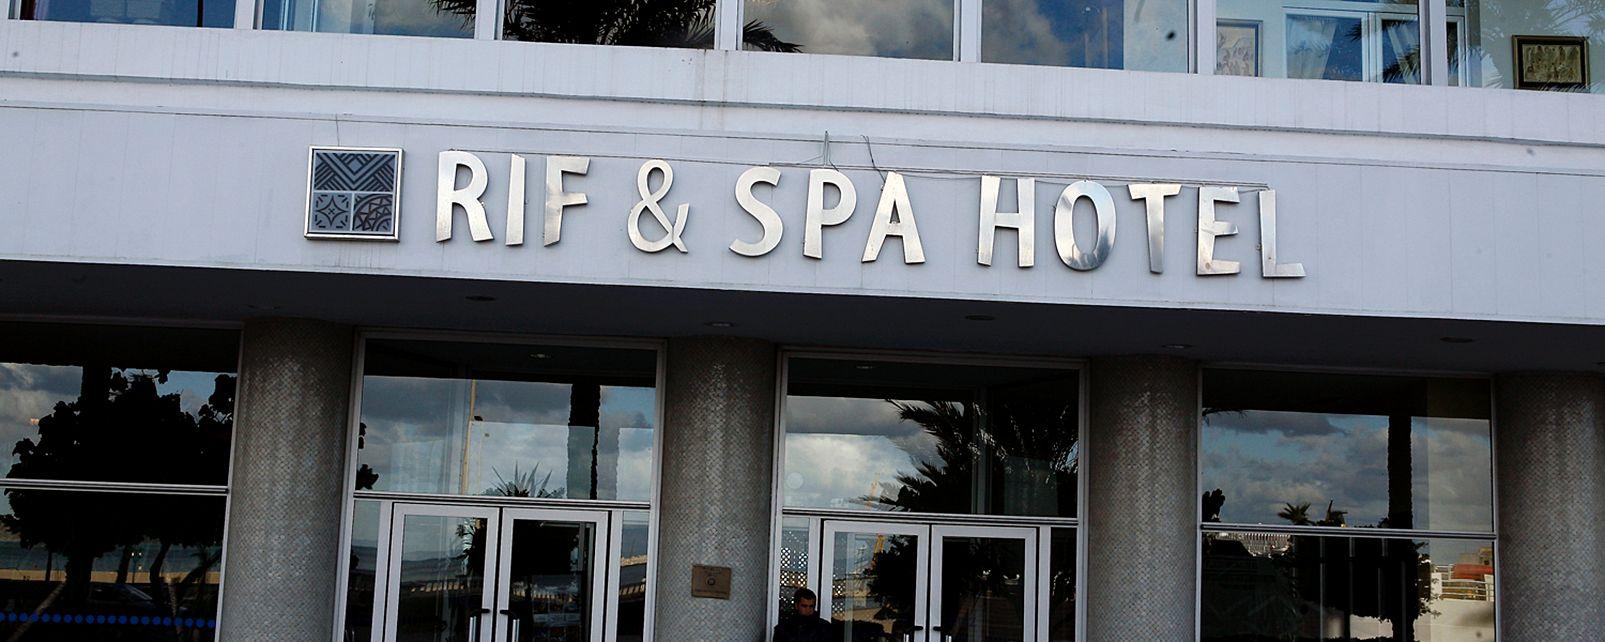 Hôtel Rif and Spa